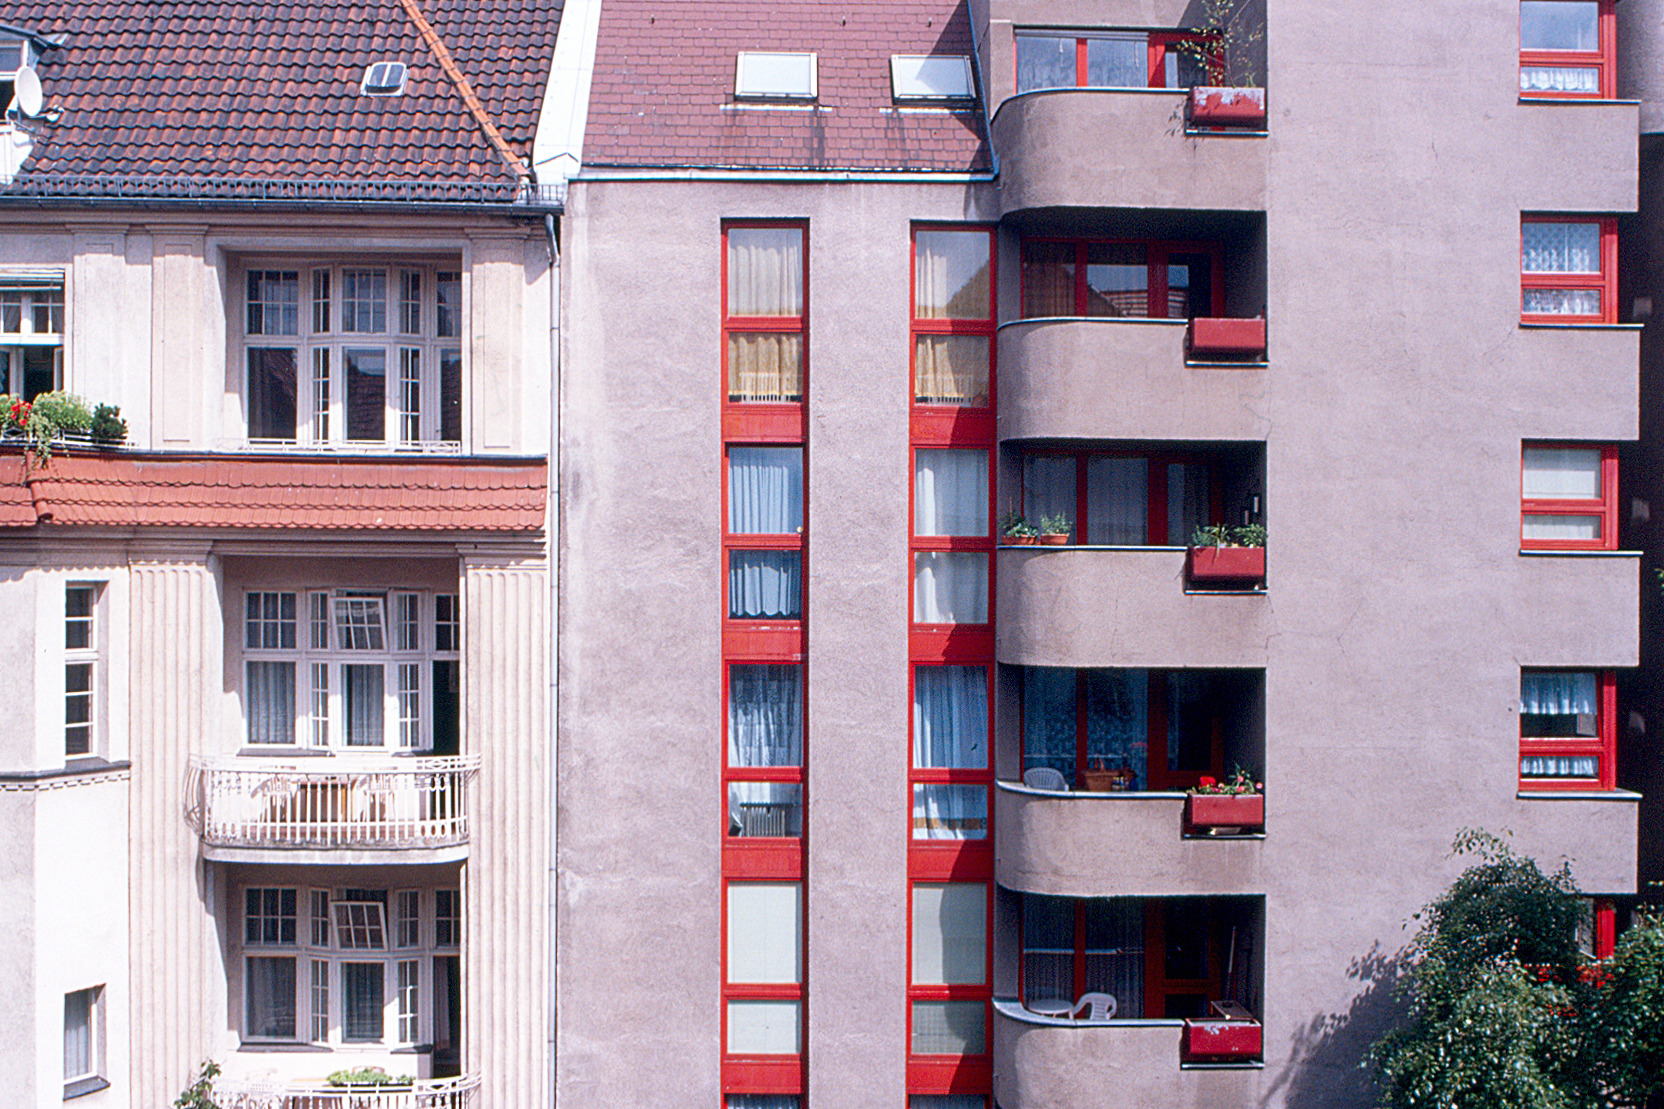 Hotel Bleibtreu Bleibtreu Str.31 Berlin, Germany Rm 43 $160